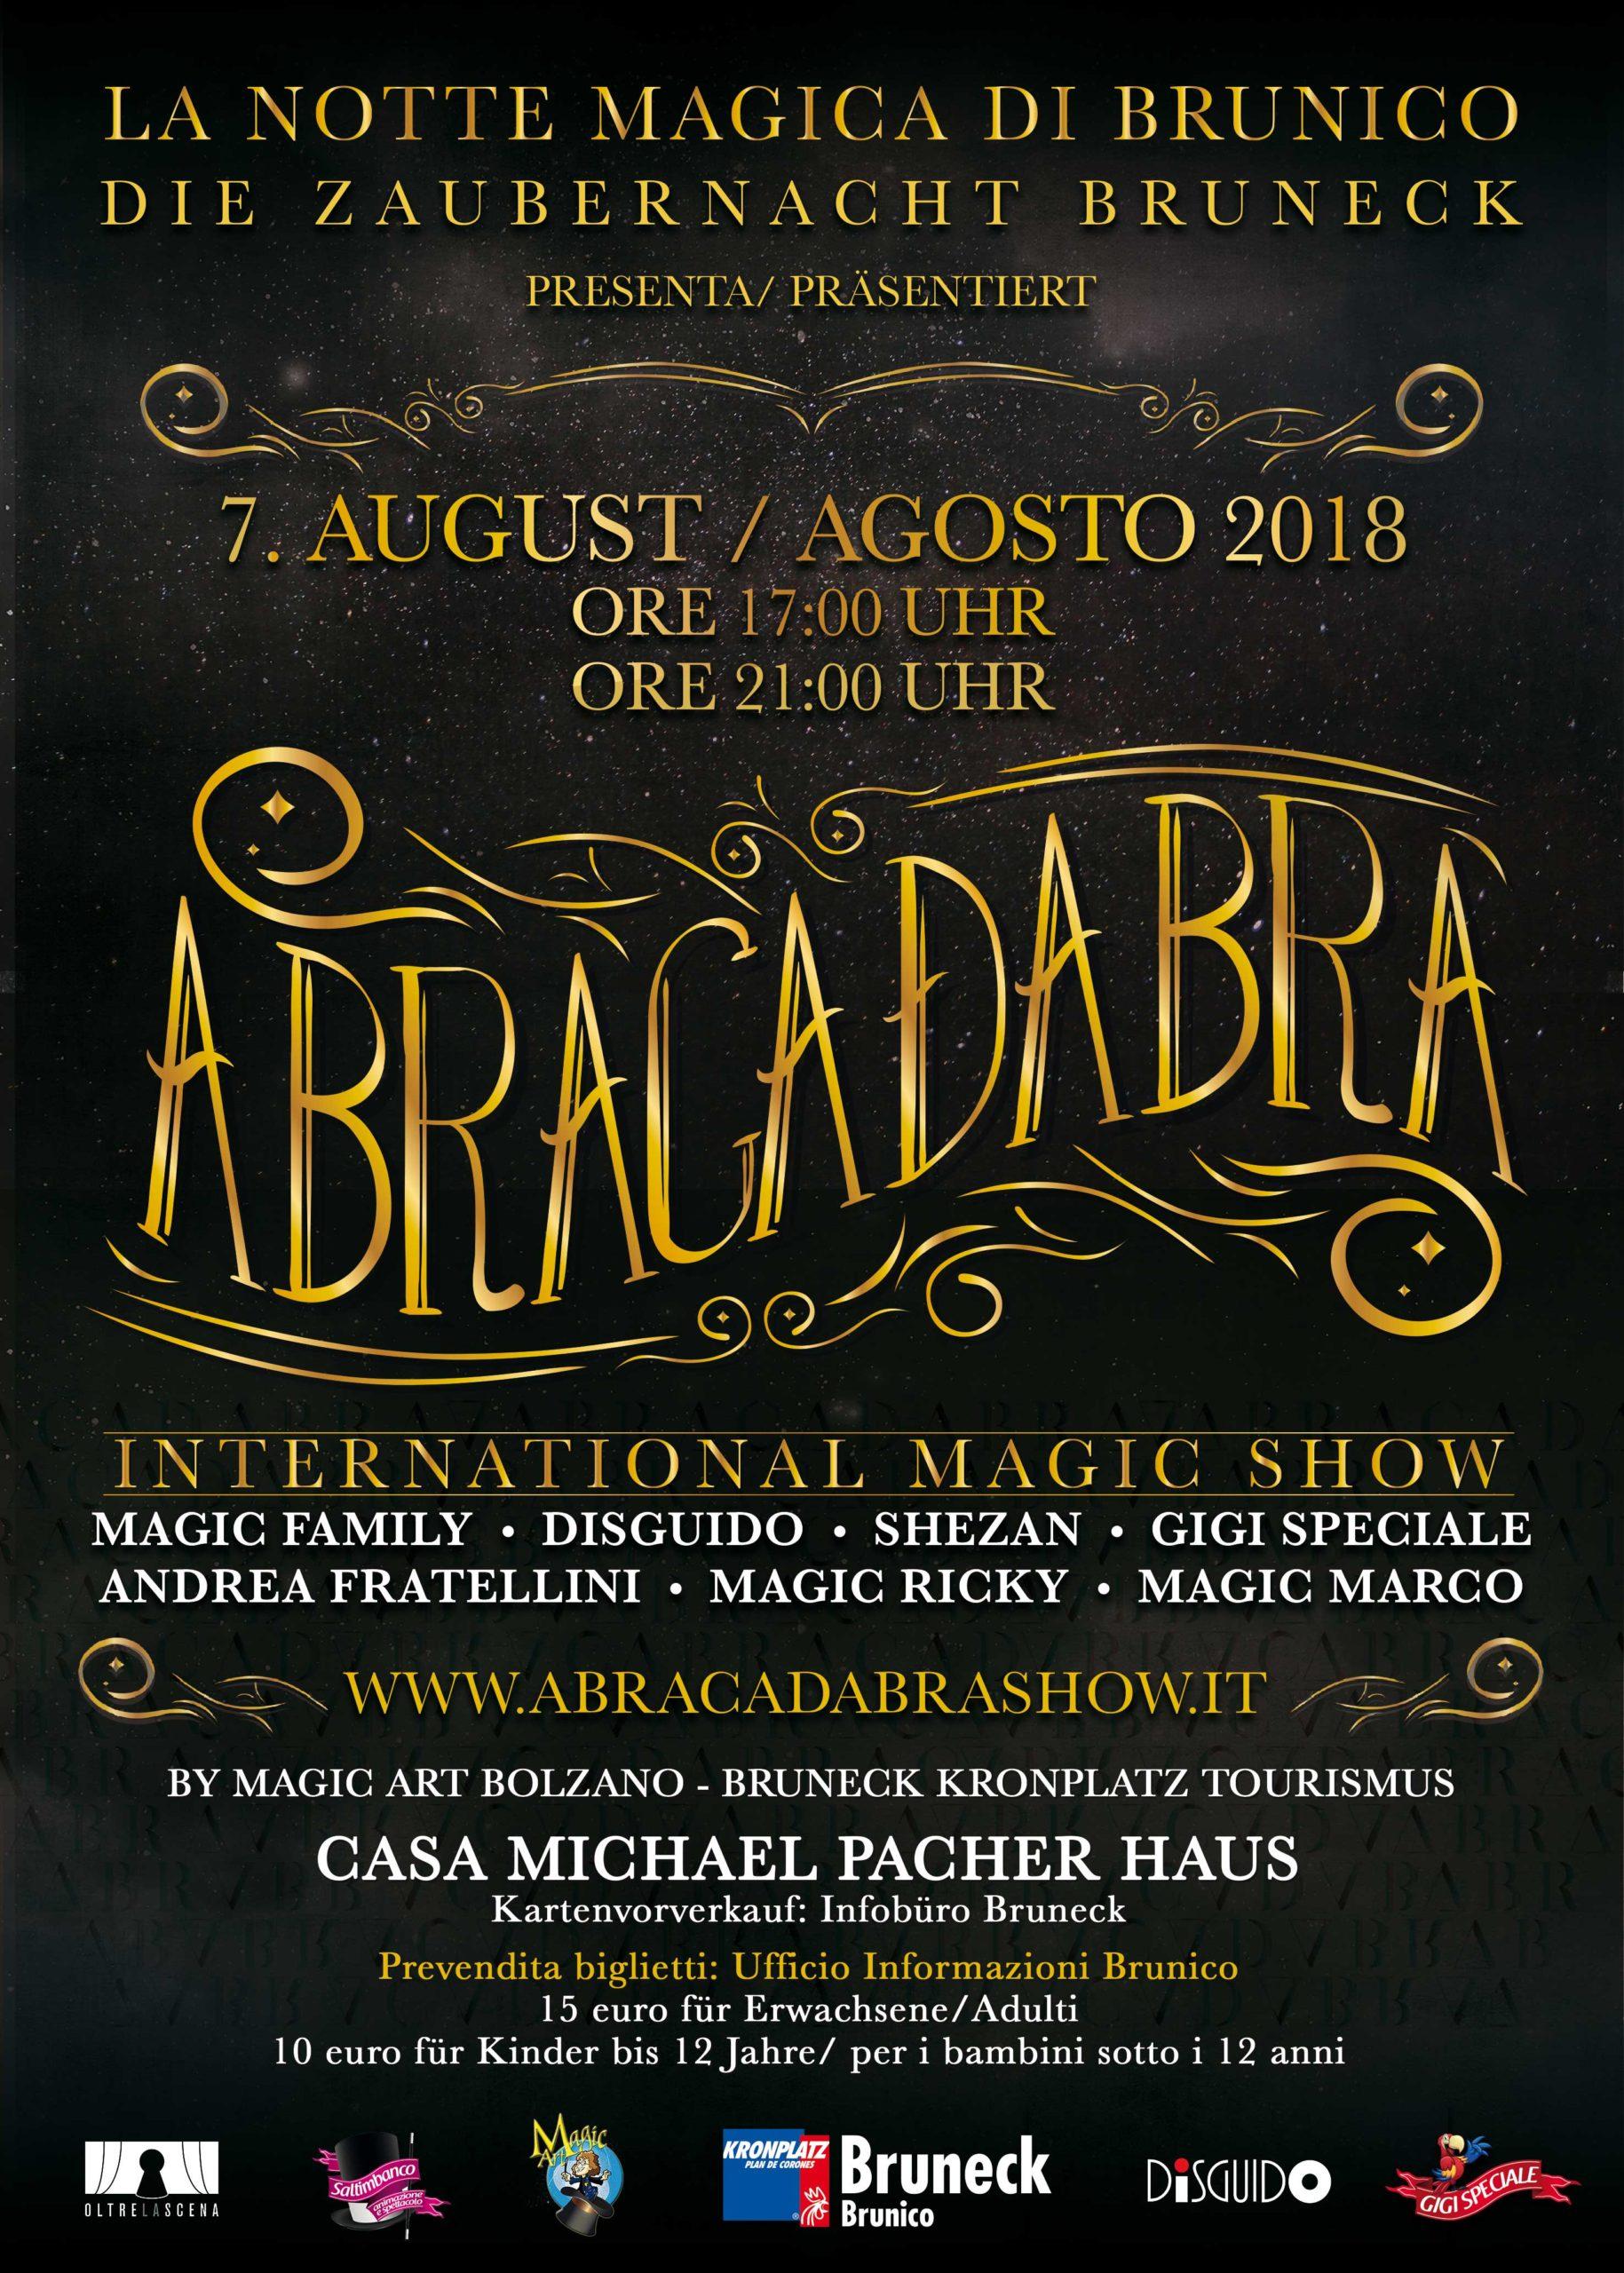 Abracadabra Brunico